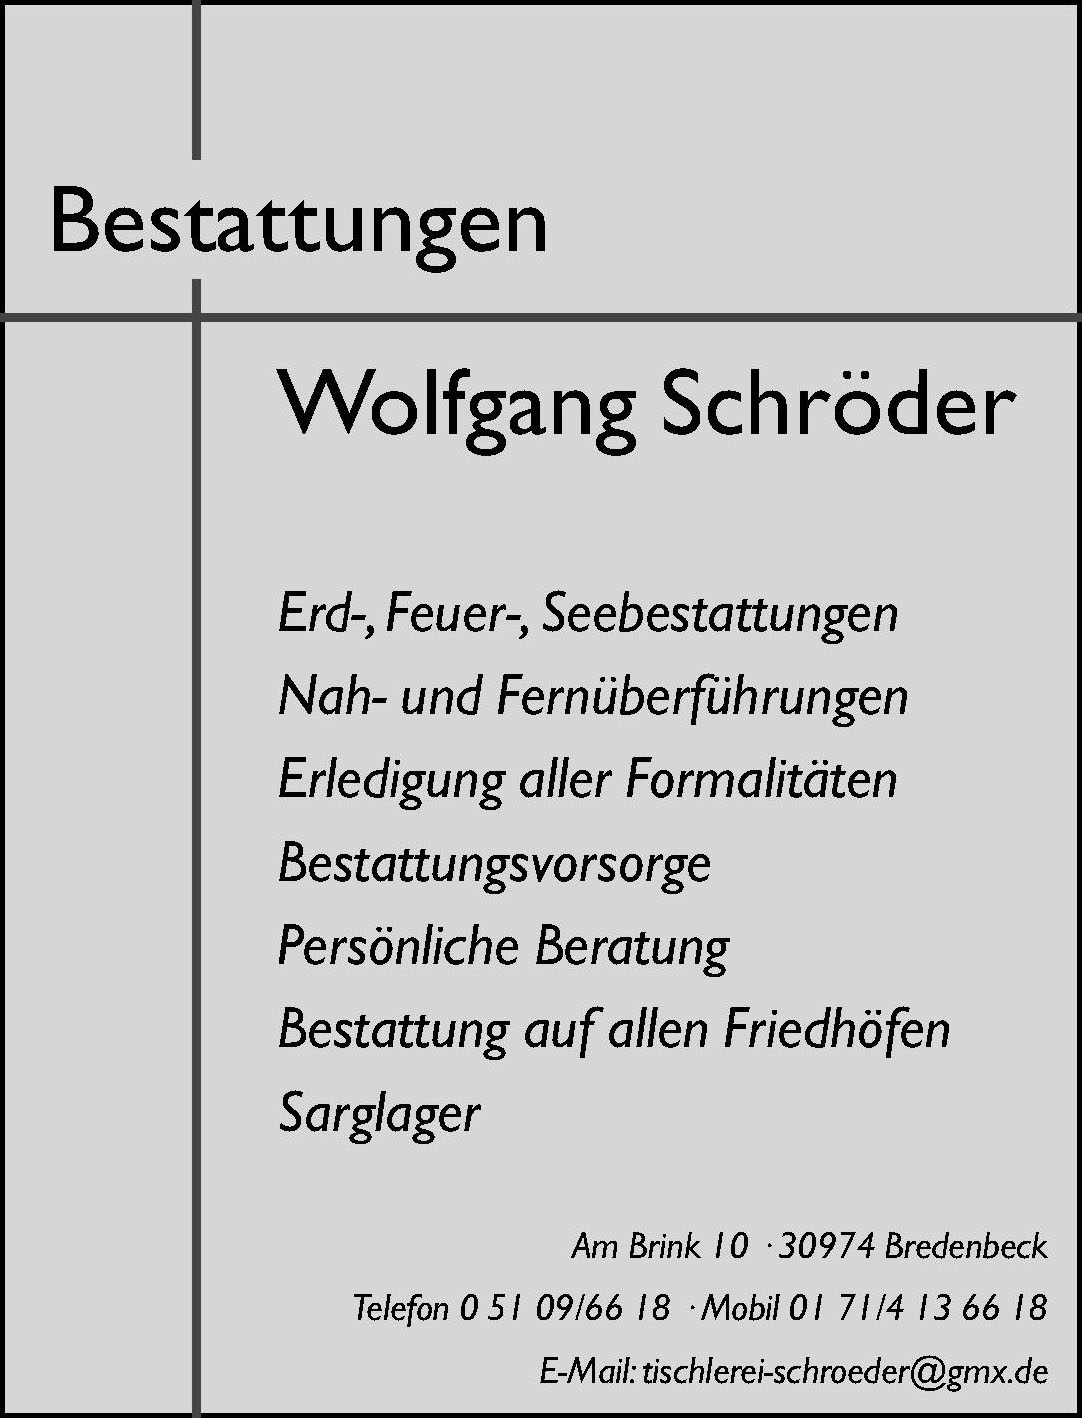 Bestattungen Wolfgang Schröder